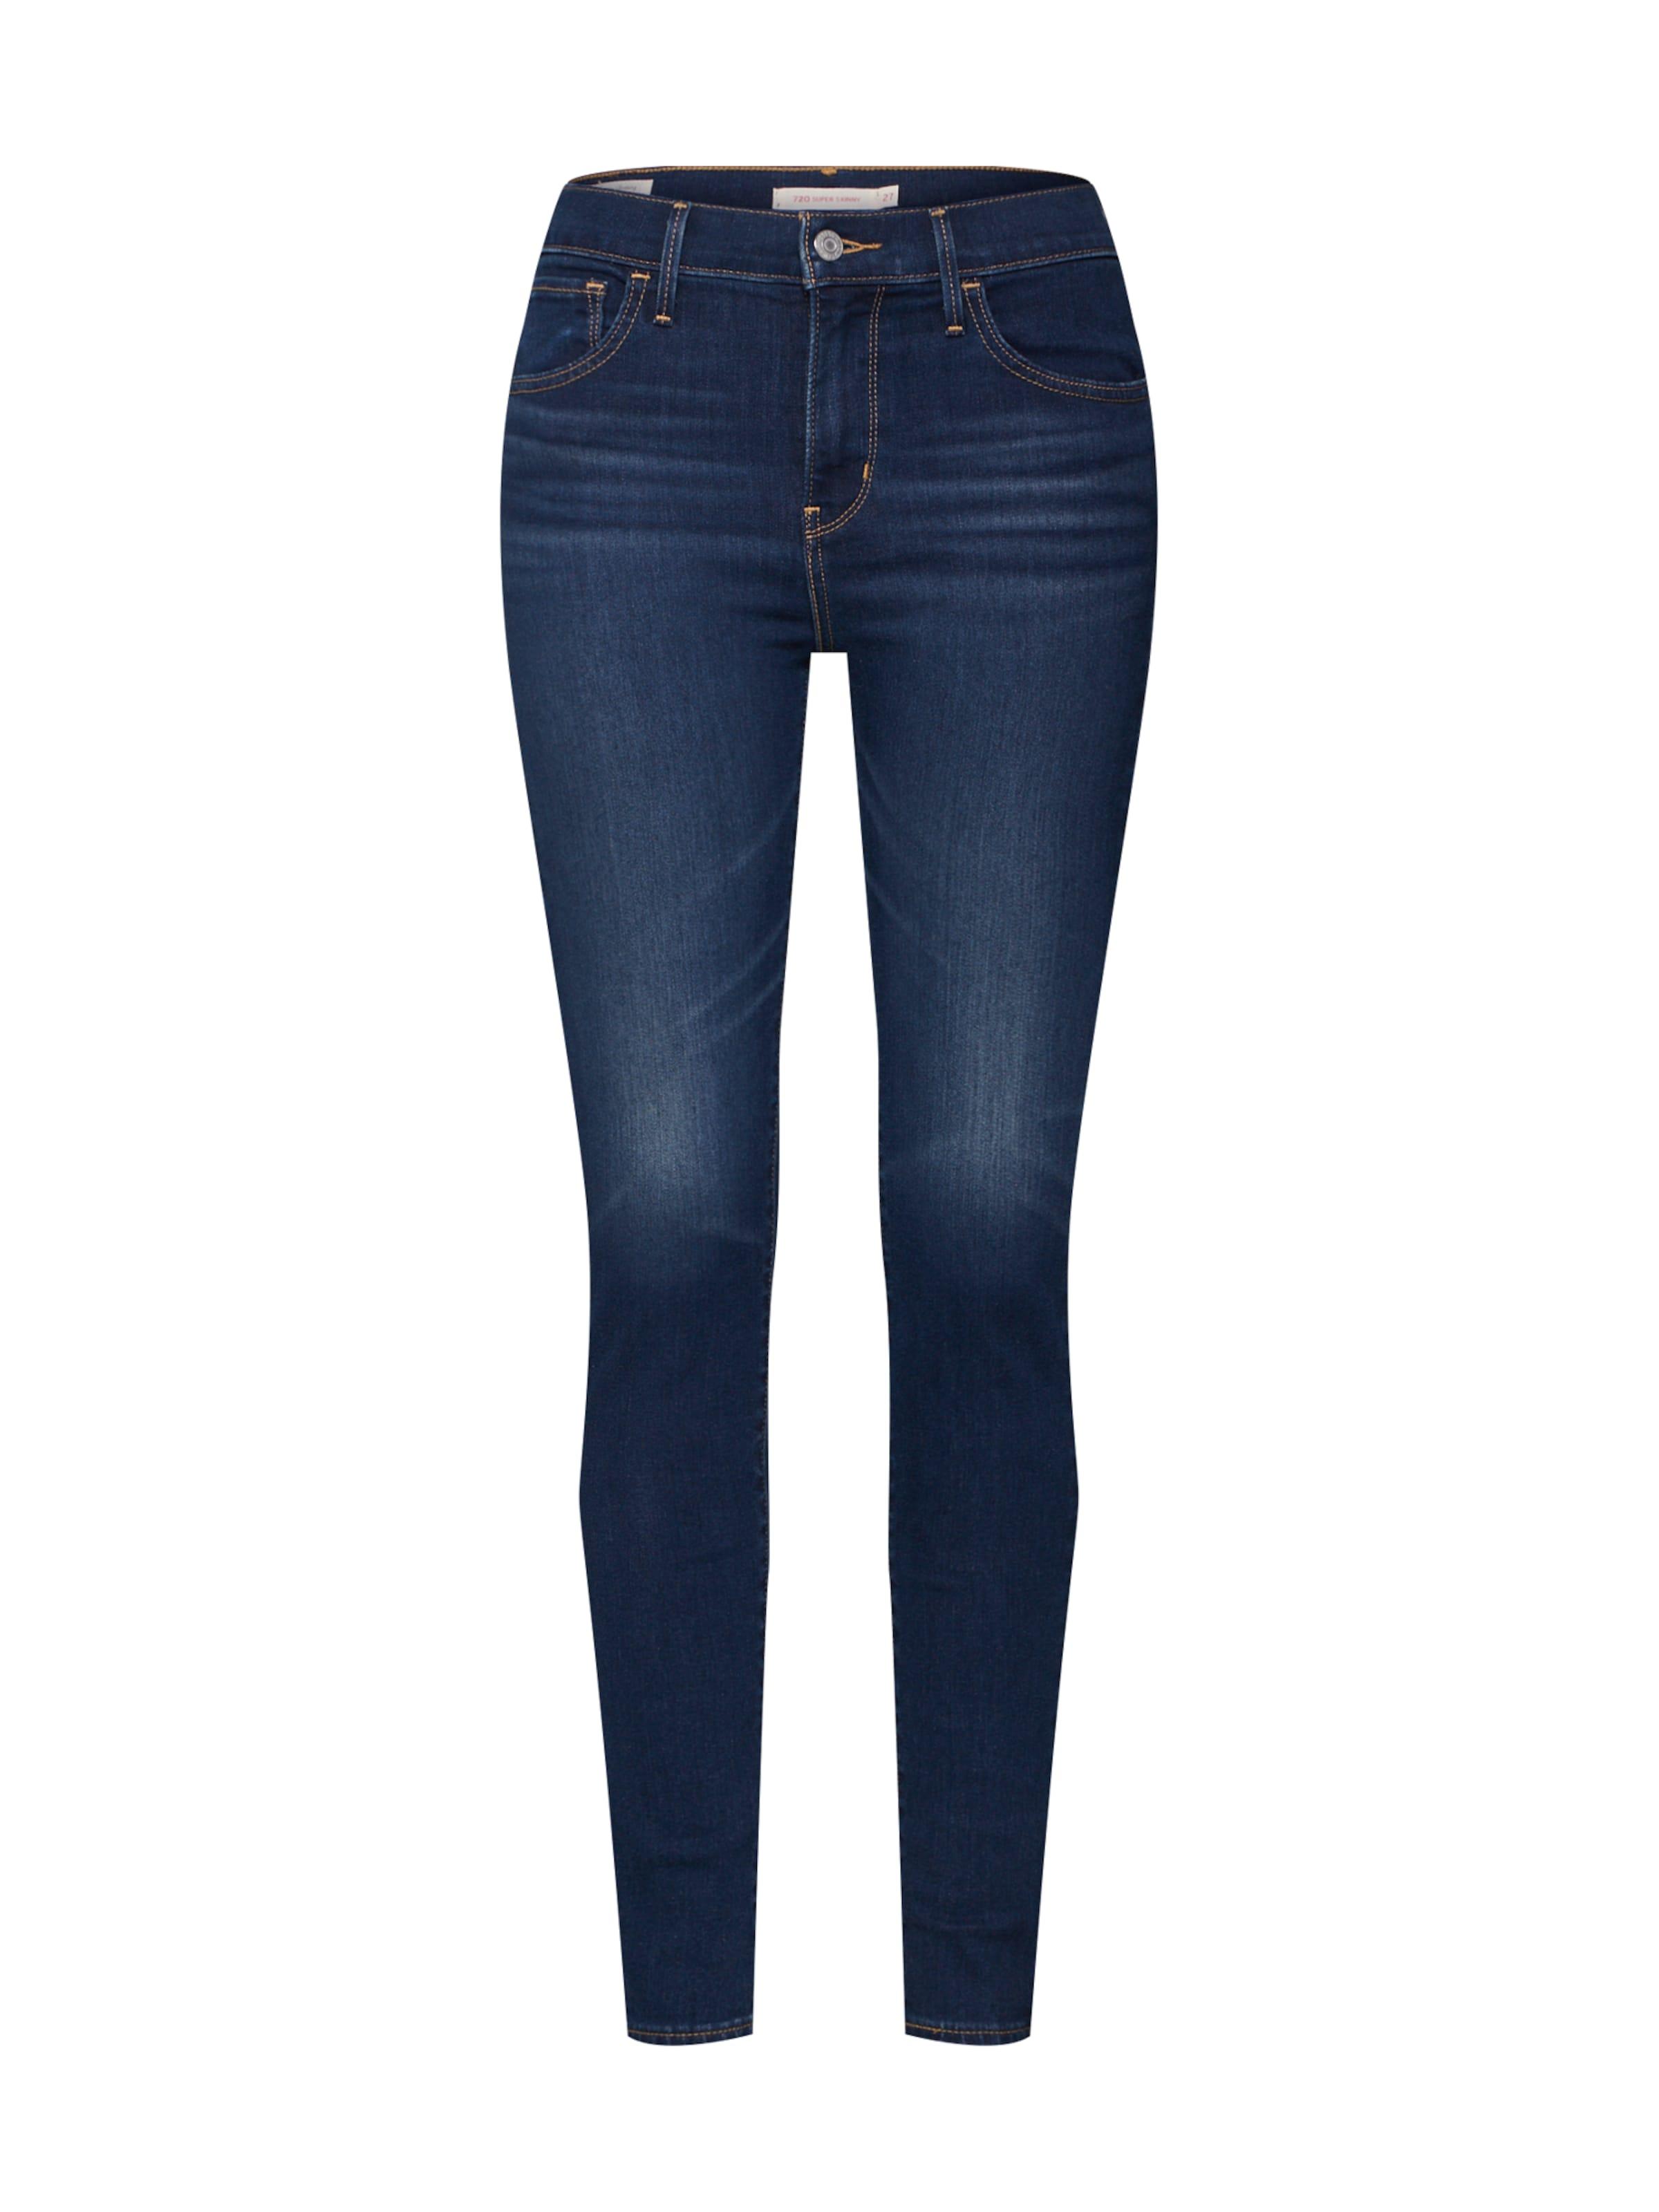 '720™ In Levi's Blue Denim Jeans Hirise' vNn0wm8